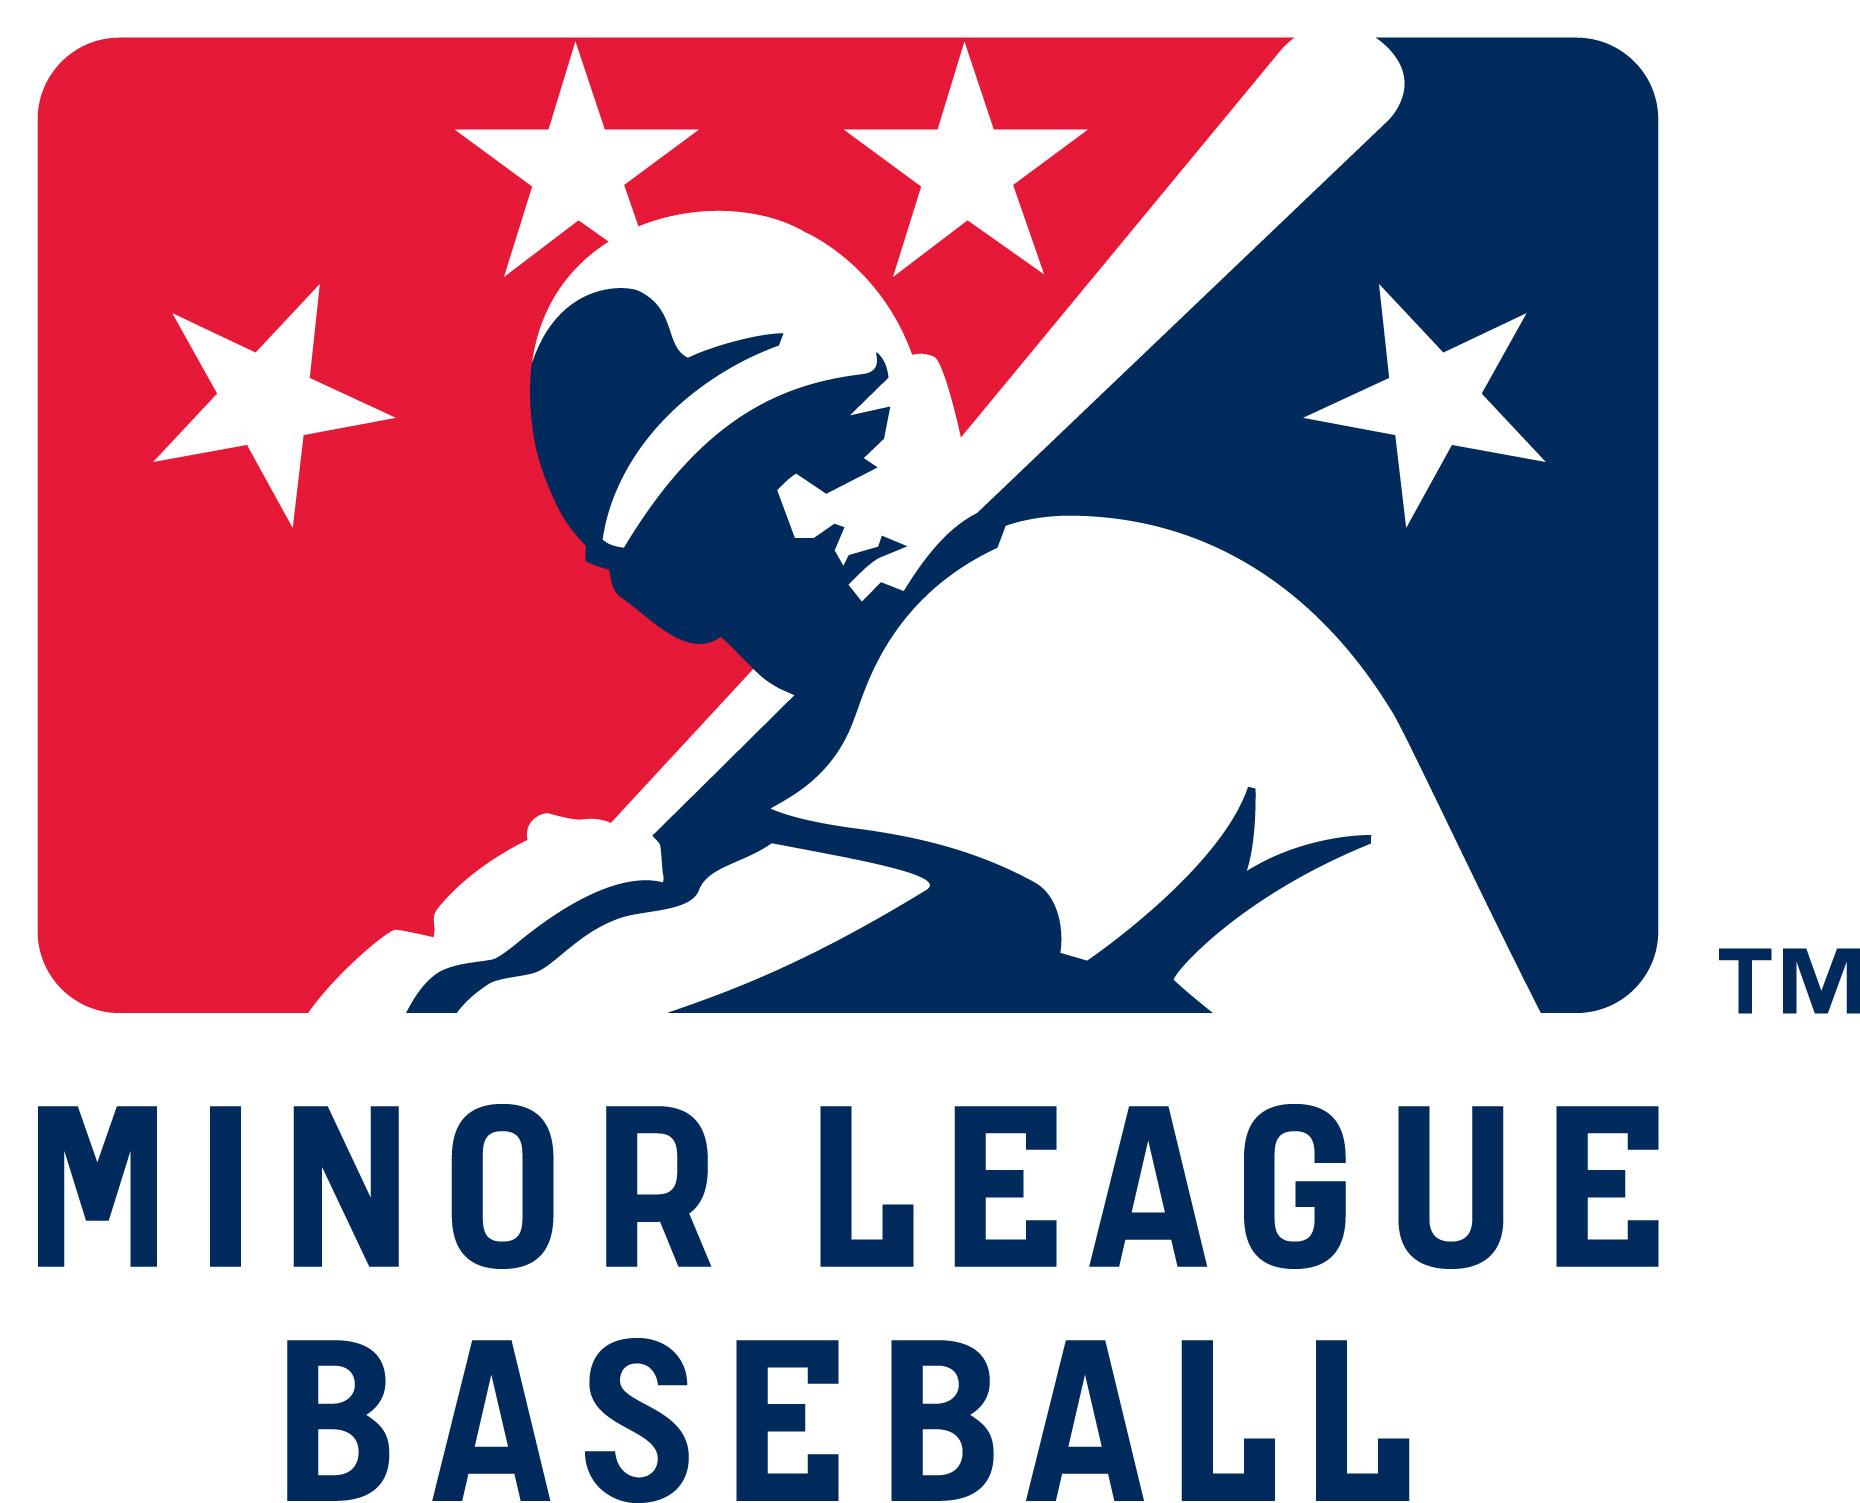 Knights Minor League Baseball Logo Minor League Baseball Logo